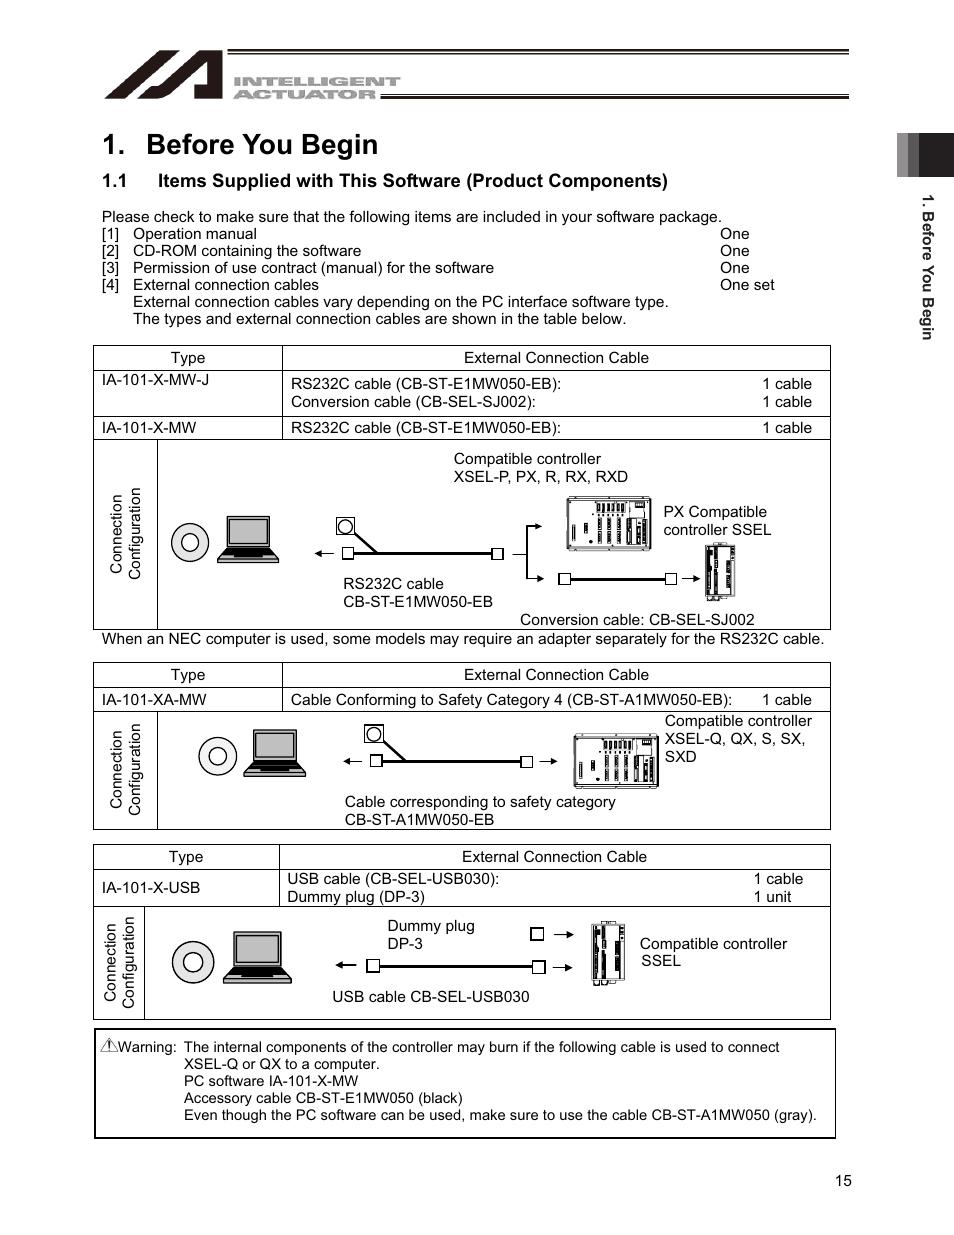 medium resolution of cb diagram st wiring e1mw050 before you begin iai america ia 101 x usbmw user manual page 23before you begin iai